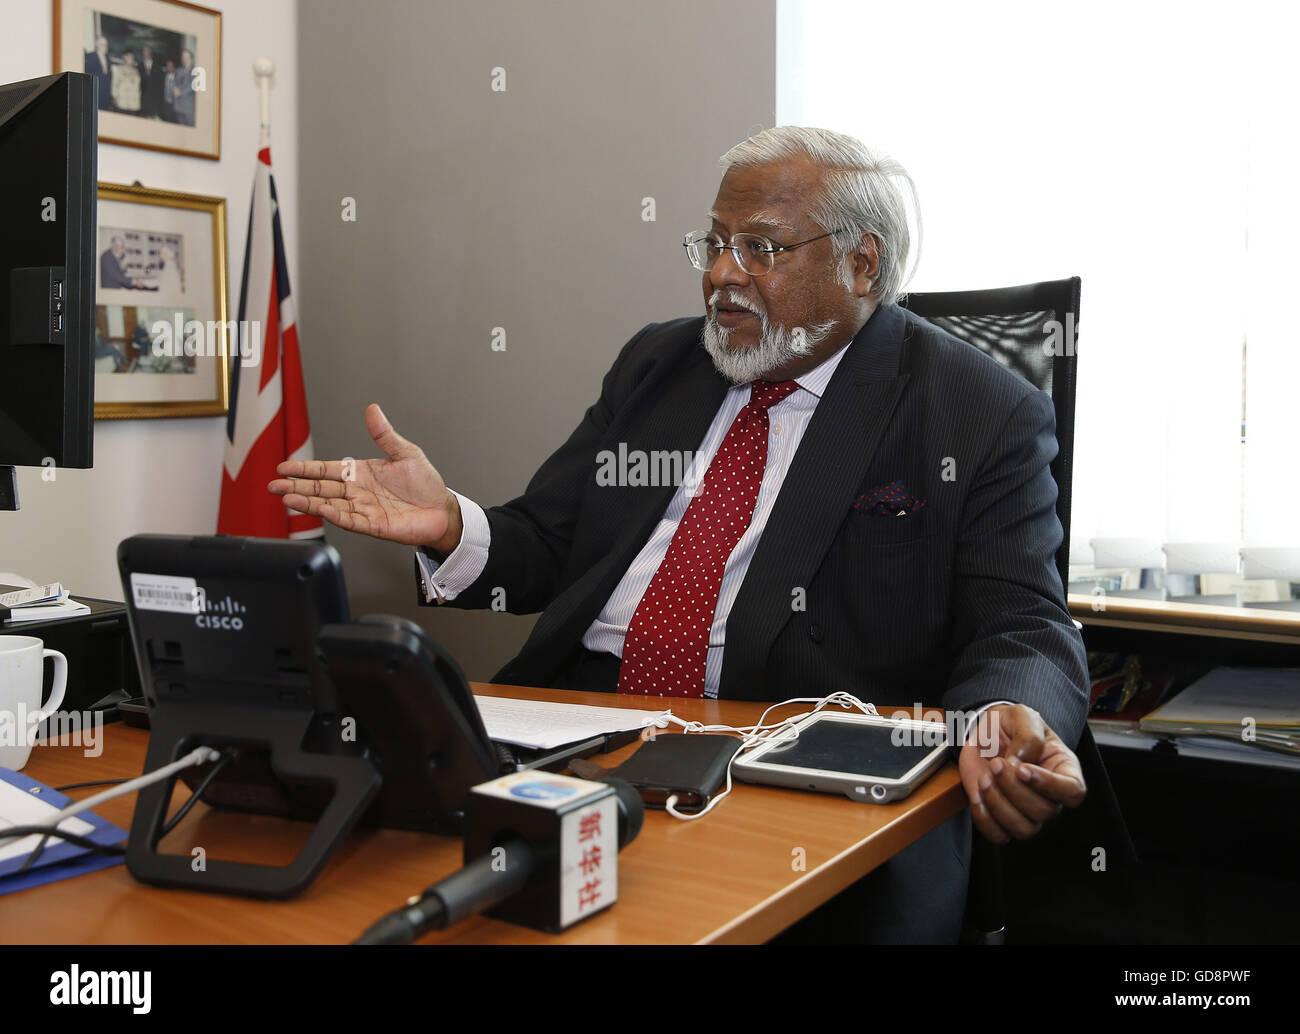 Brussels, Belgium. 12th July, 2016. Nirj Deva, vice chairman of the European Parliament's Development Committee - Stock Image